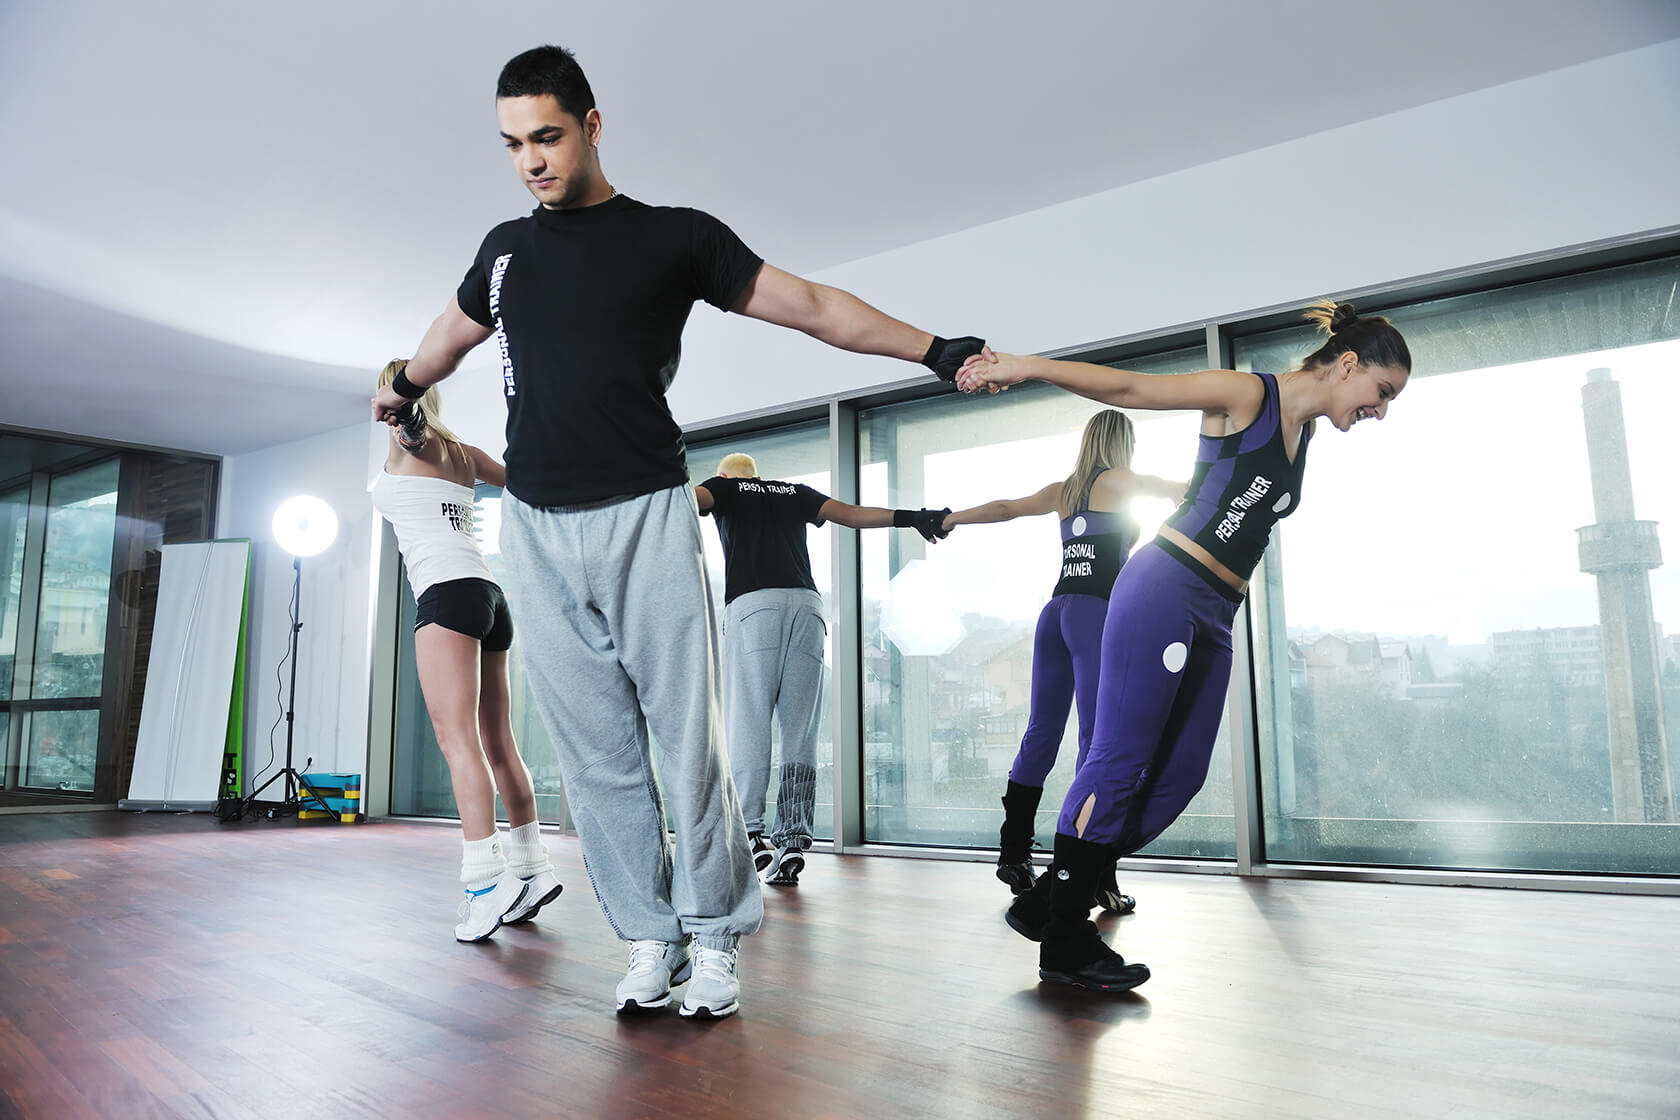 fitness group PHUSFKC1 - باشگاه ورزشی و طراحی نما